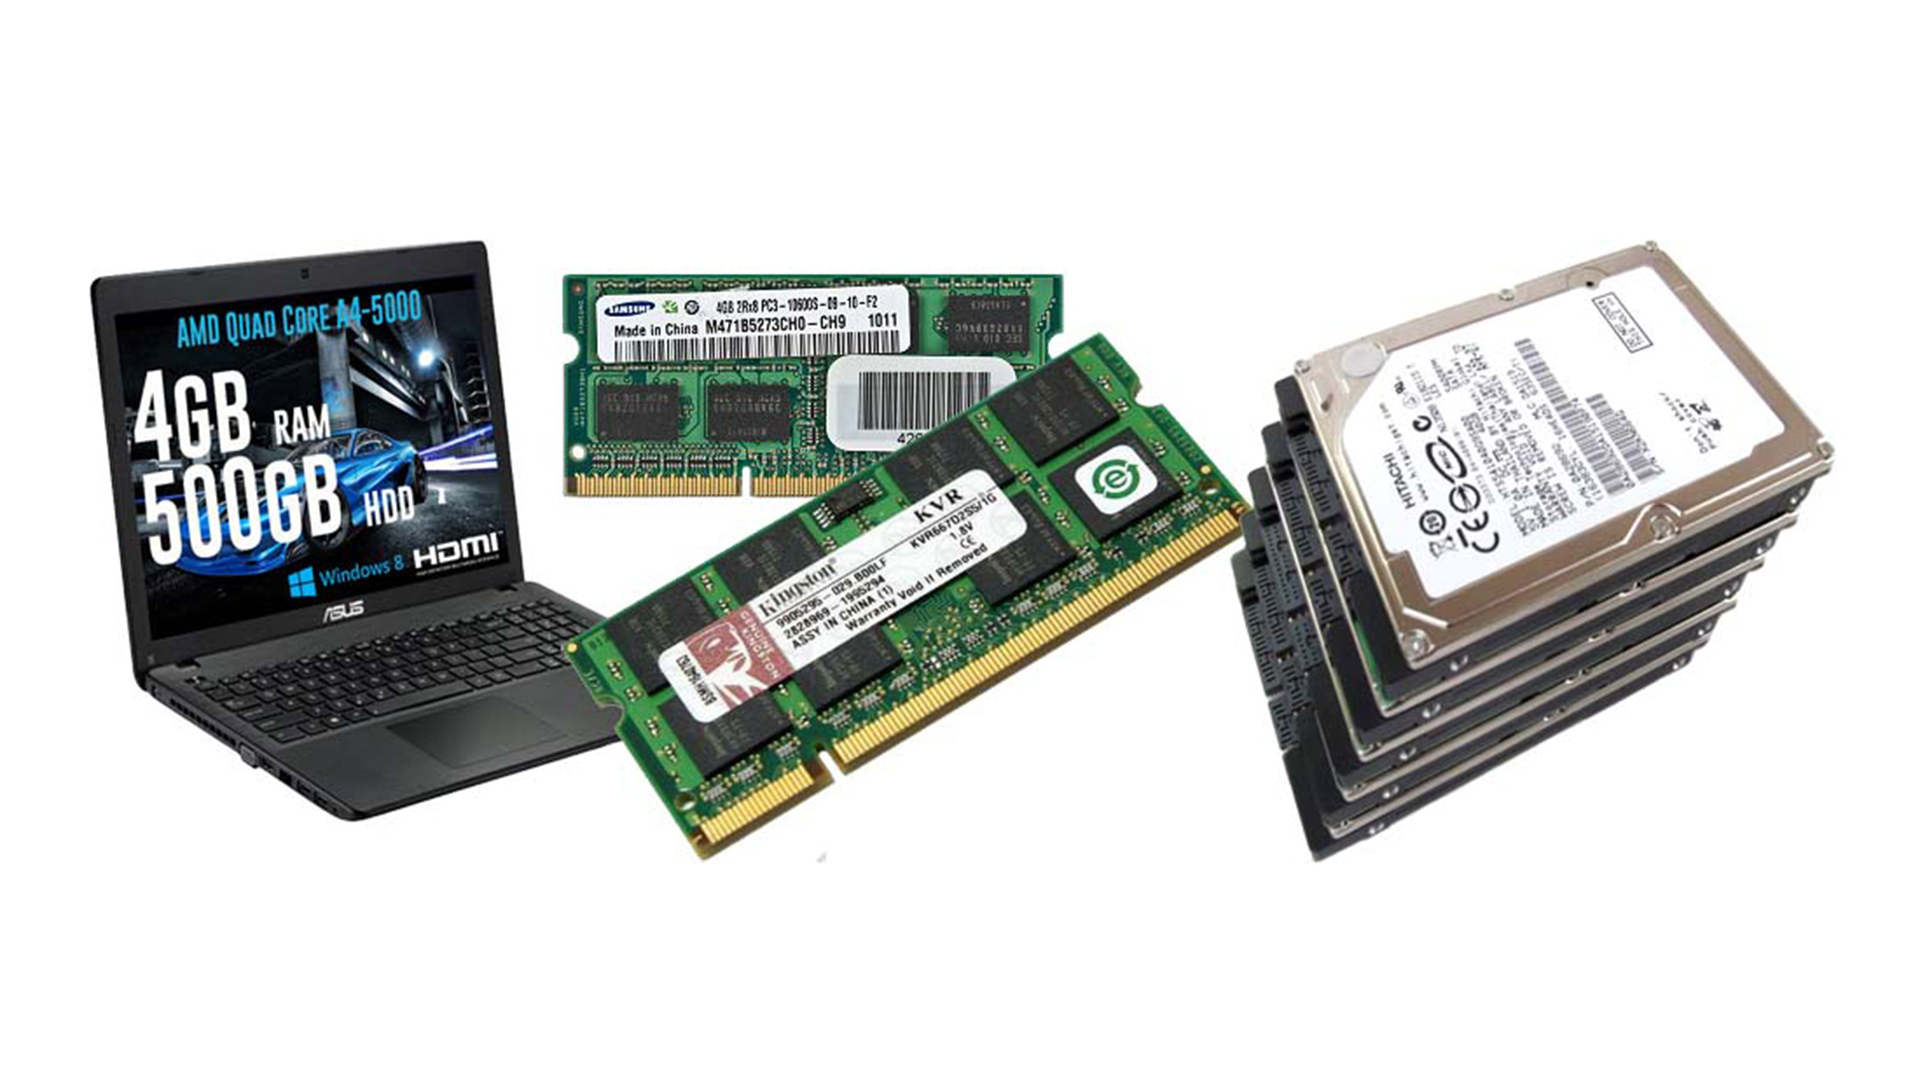 laptop-ram-and-hard-disk-upgrade-jpg.11921